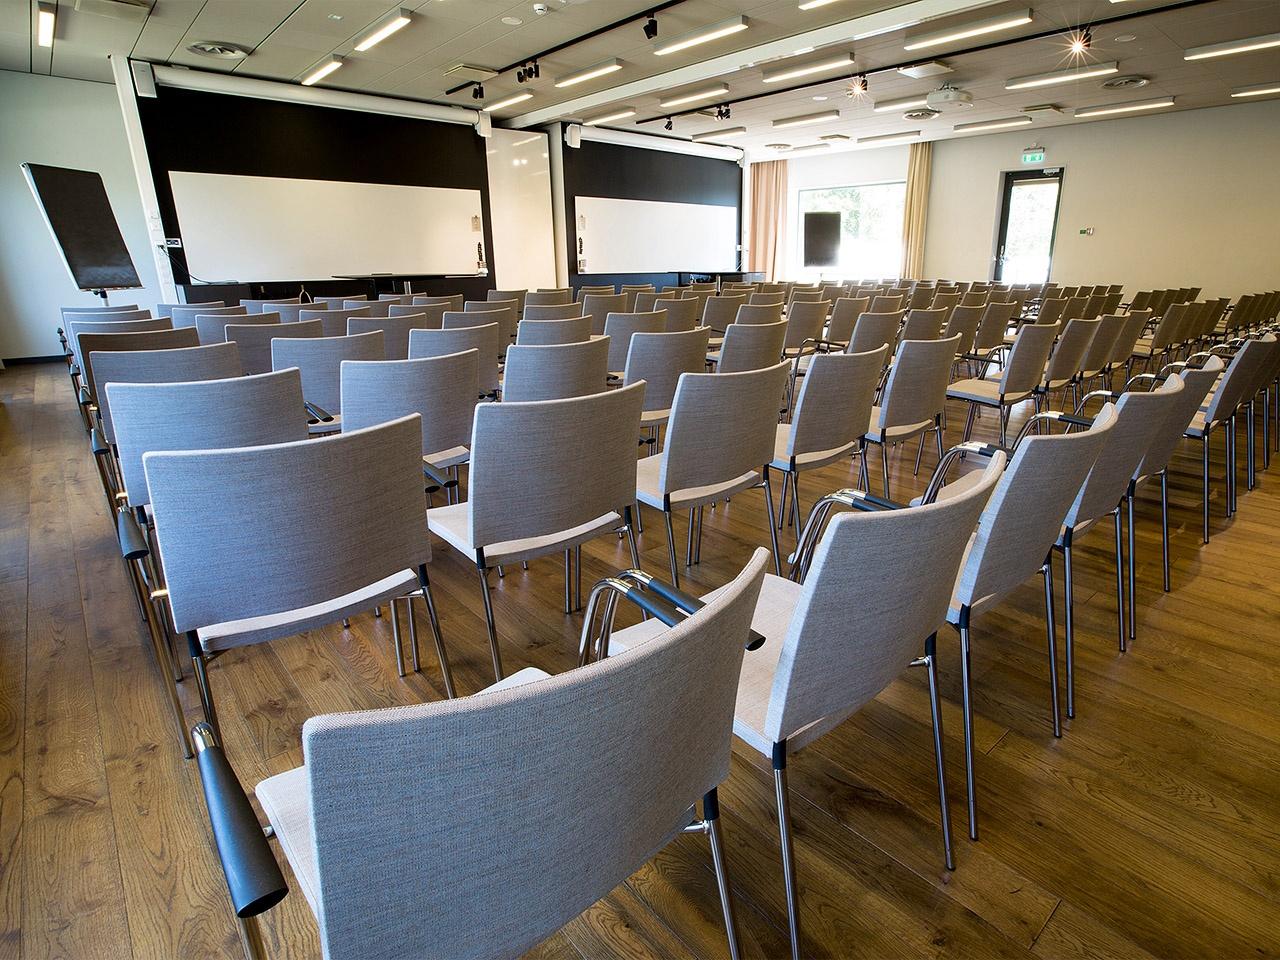 konferenslokal_sittning_bio_newyork